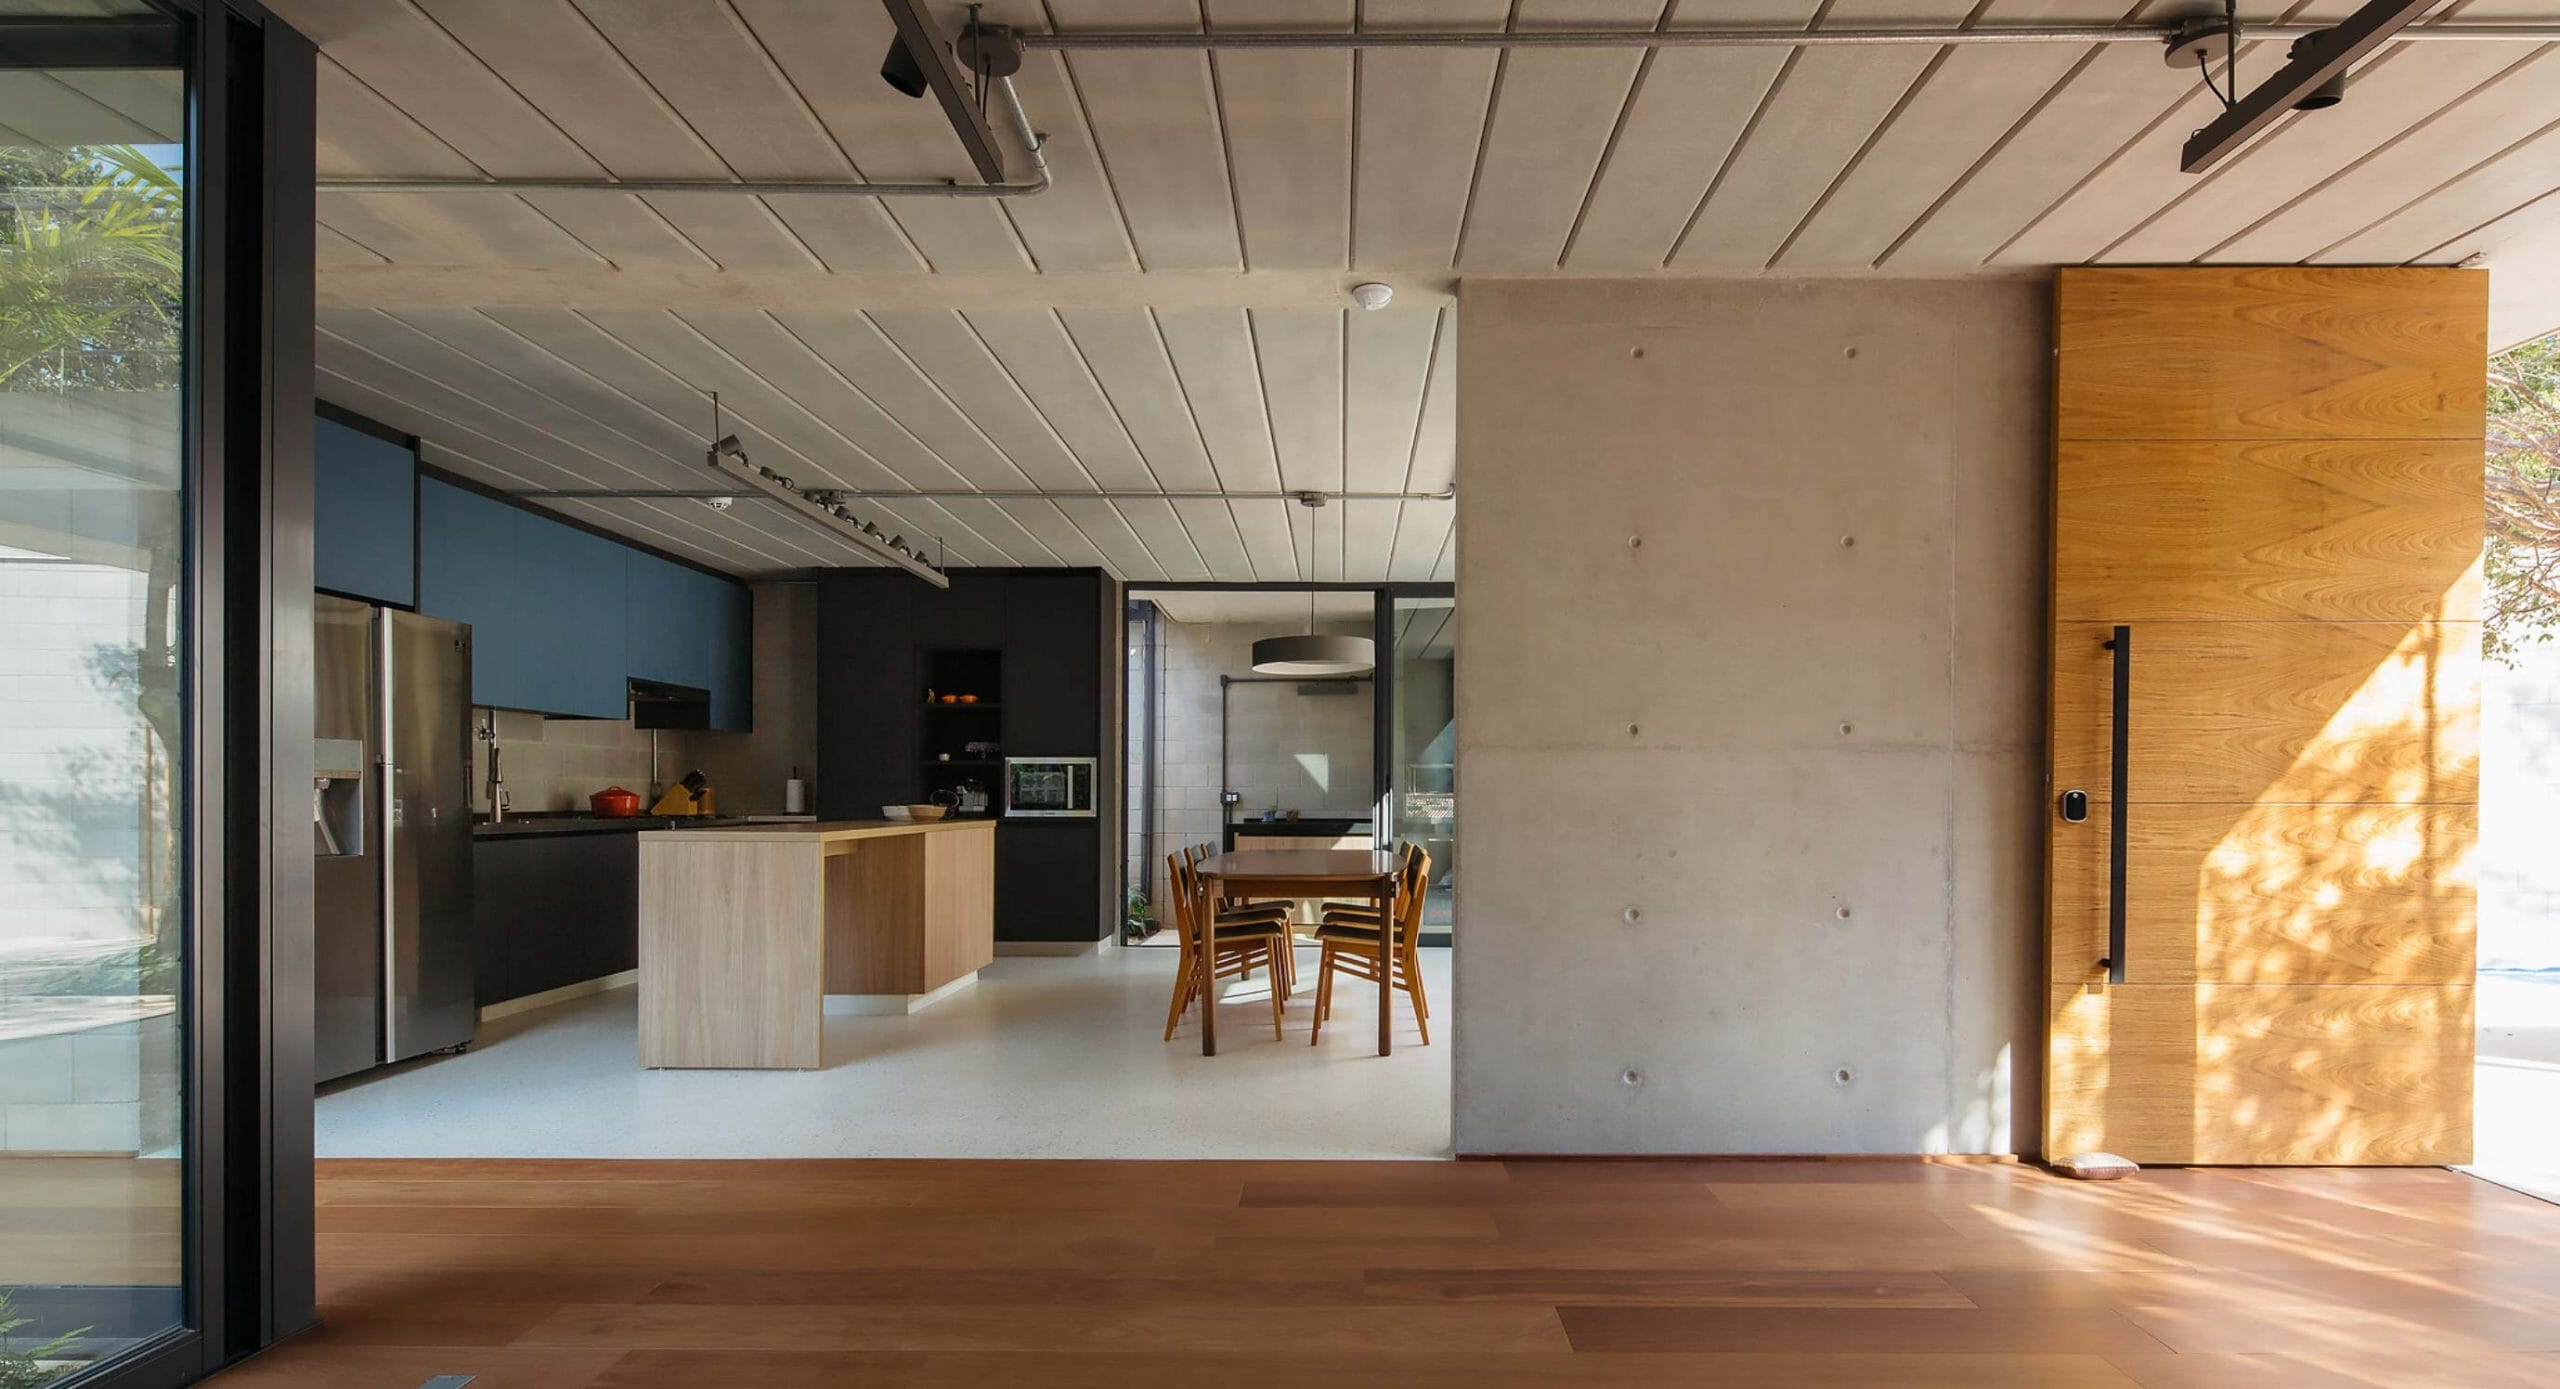 Jabuticabeiras House: Designing around nature